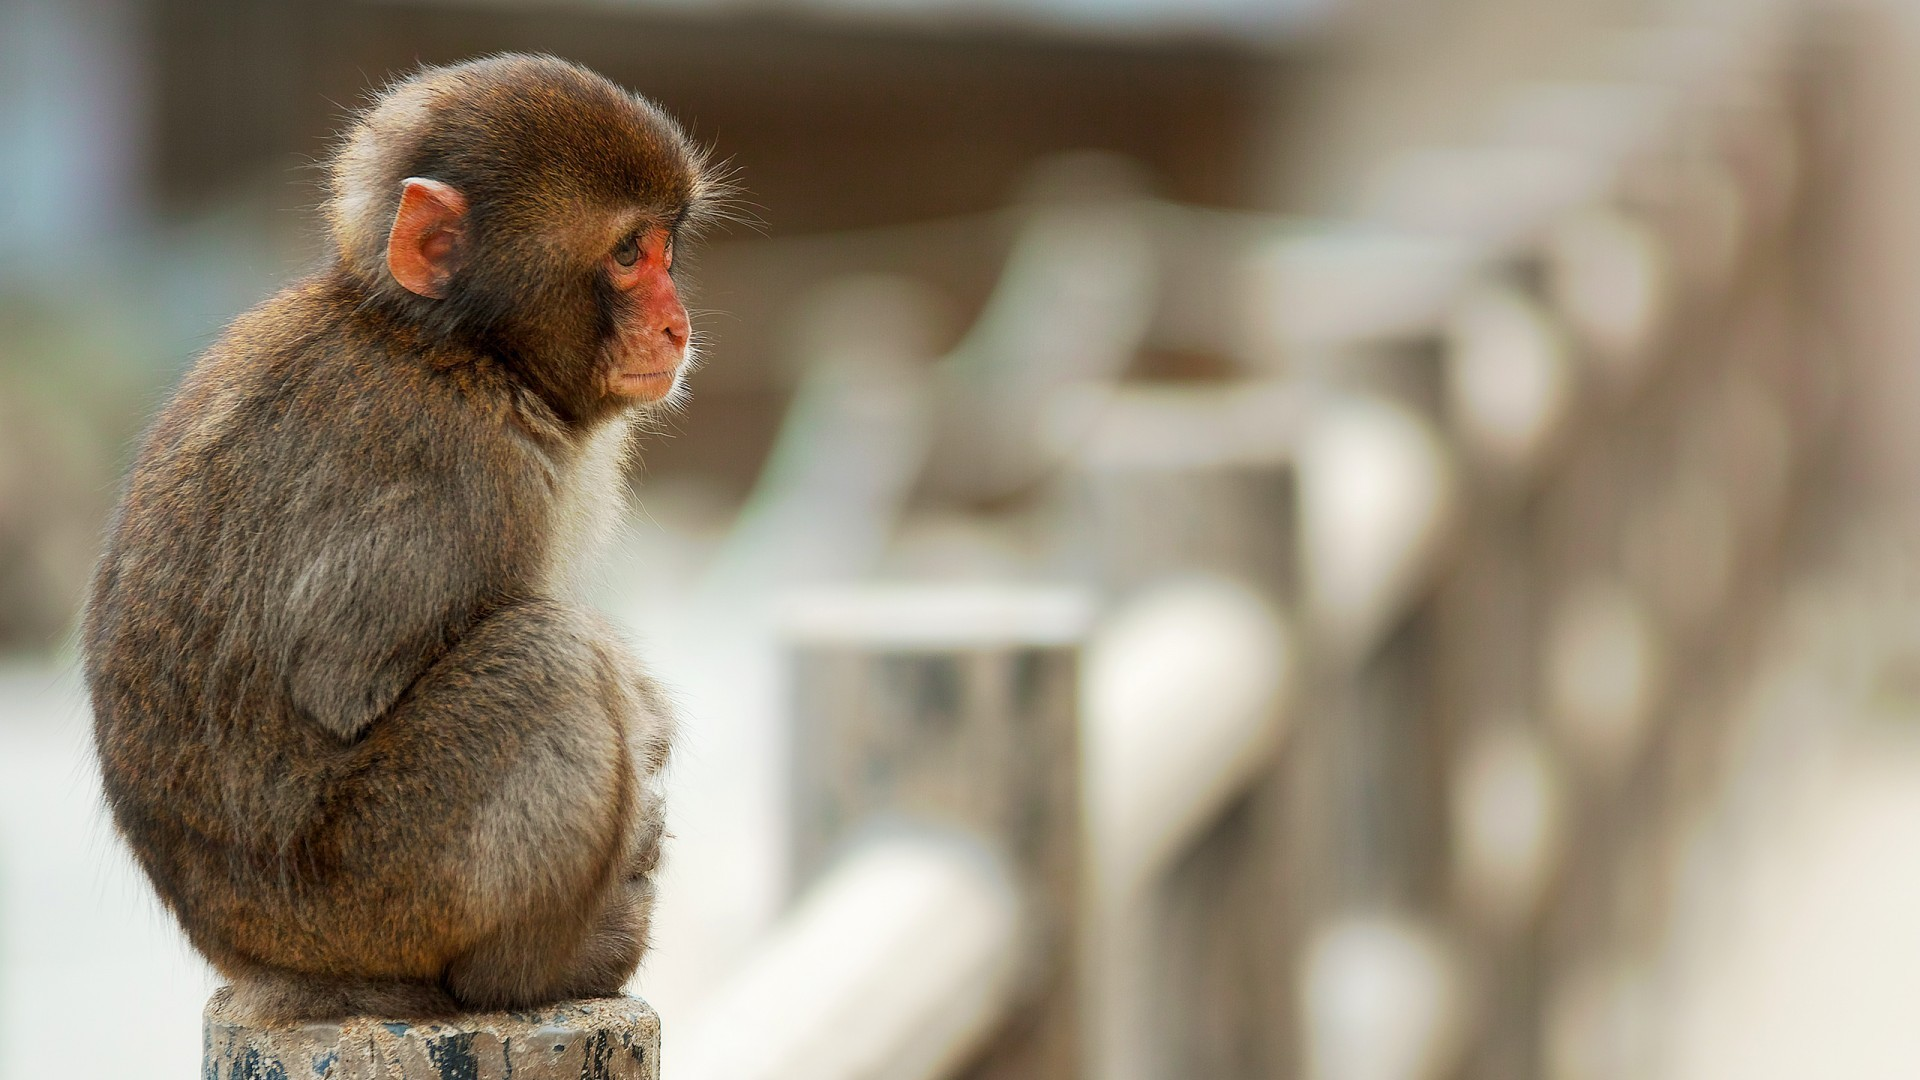 Cute baby monkey wallpapers